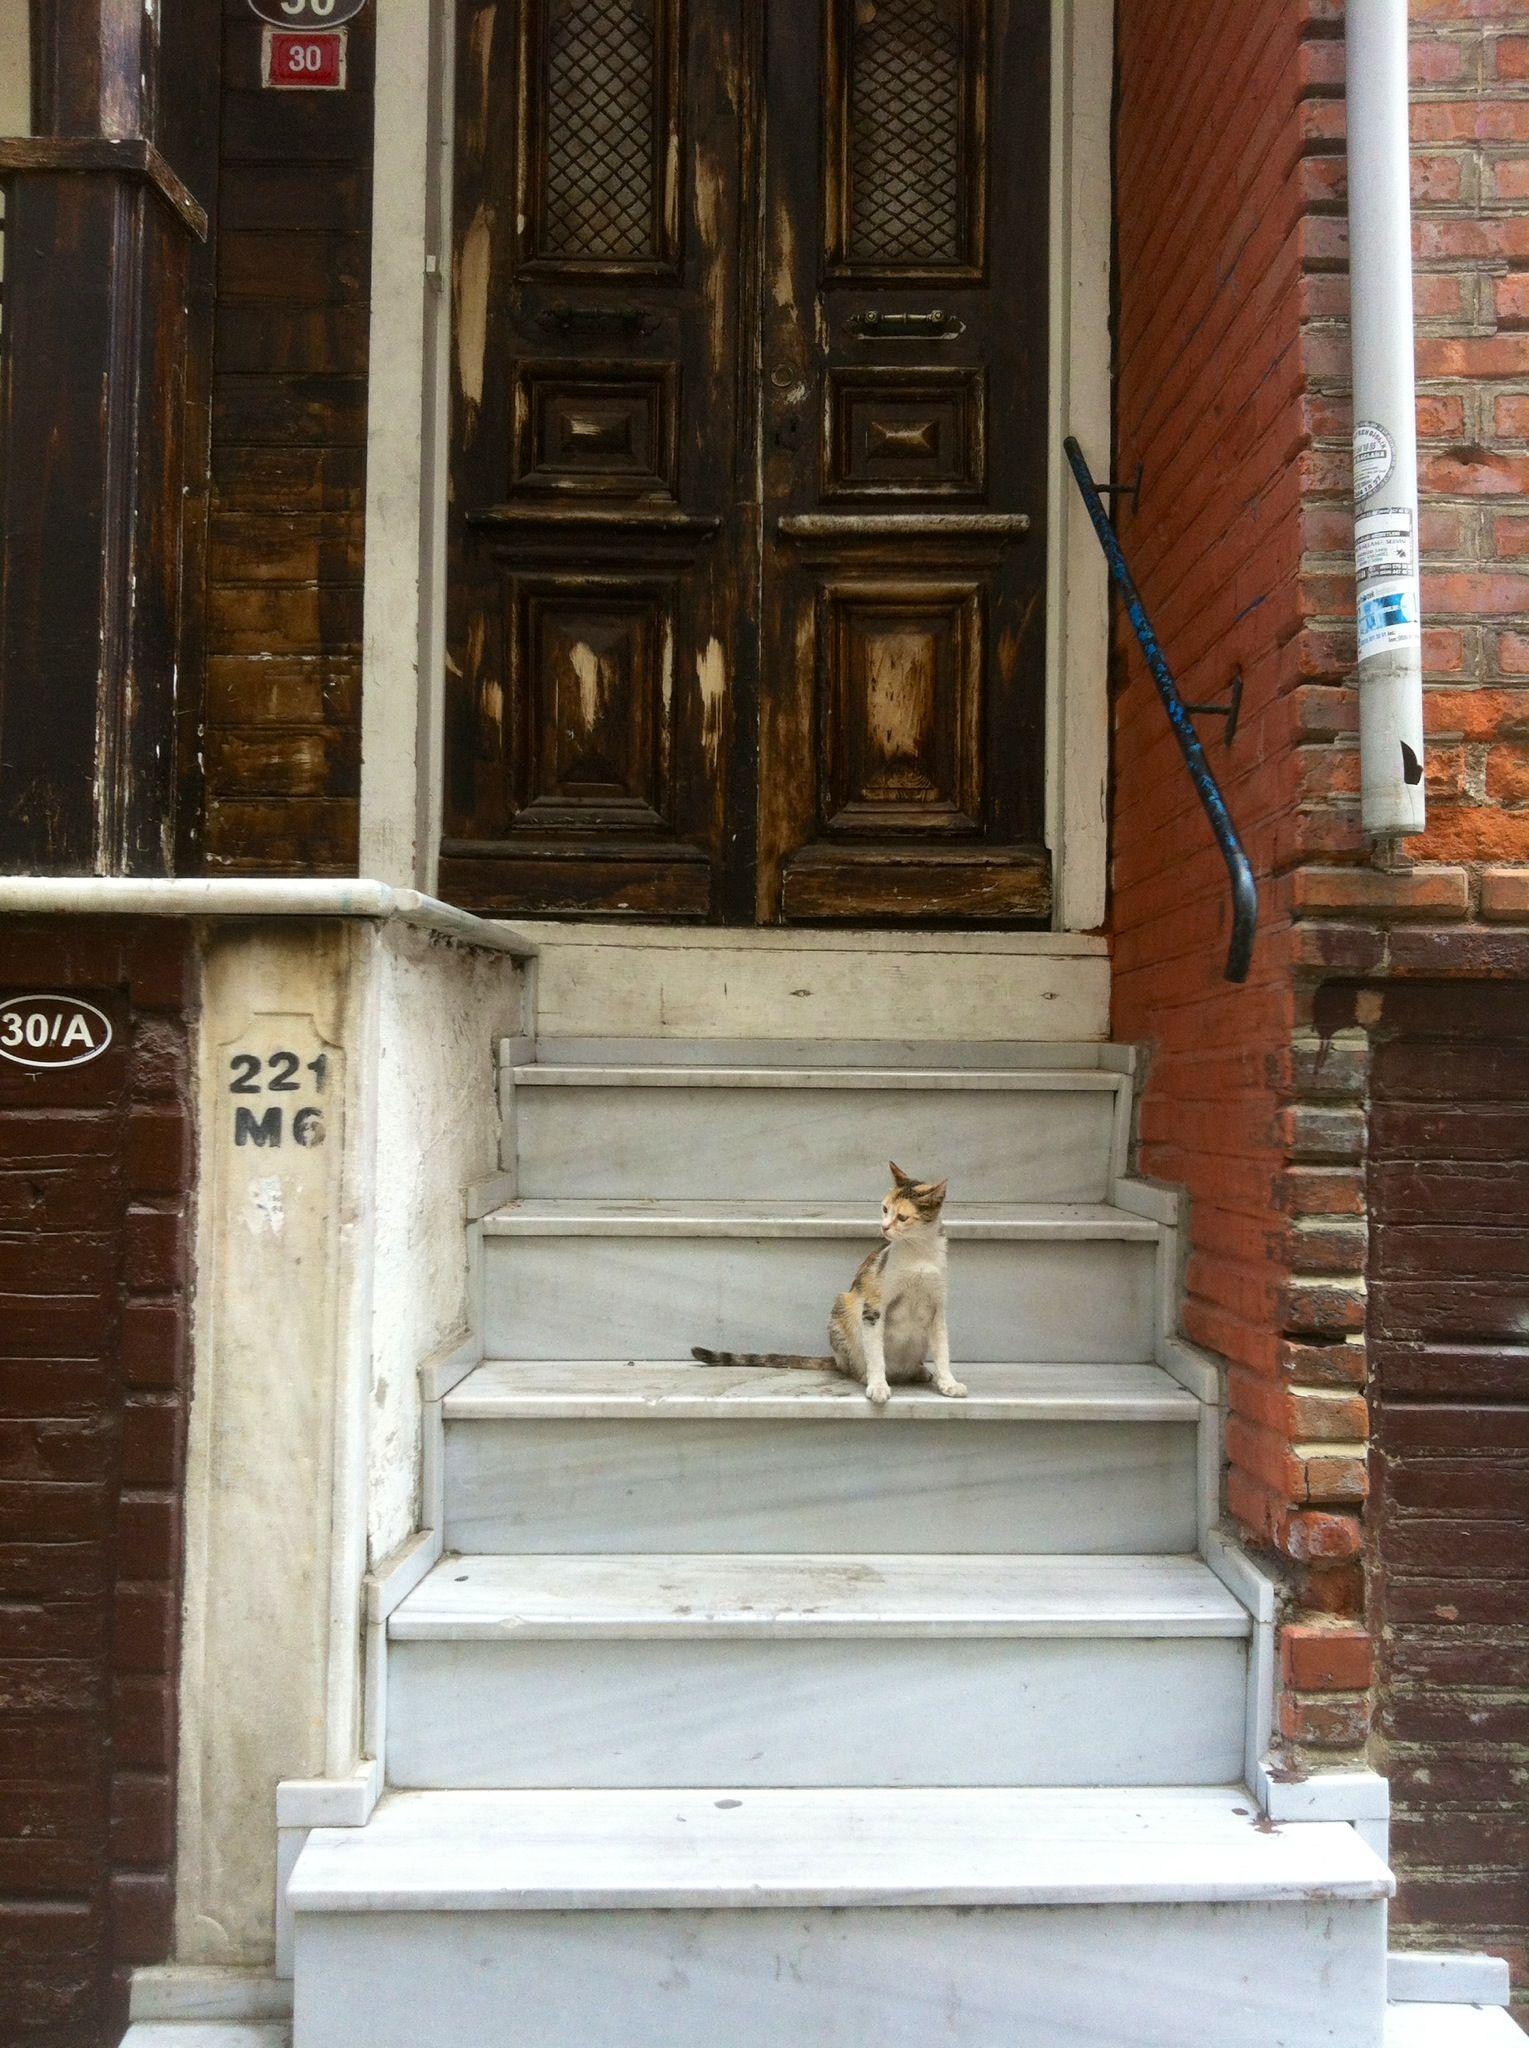 Stray cat, old door. August 2012, Kadikoy, Istanbul